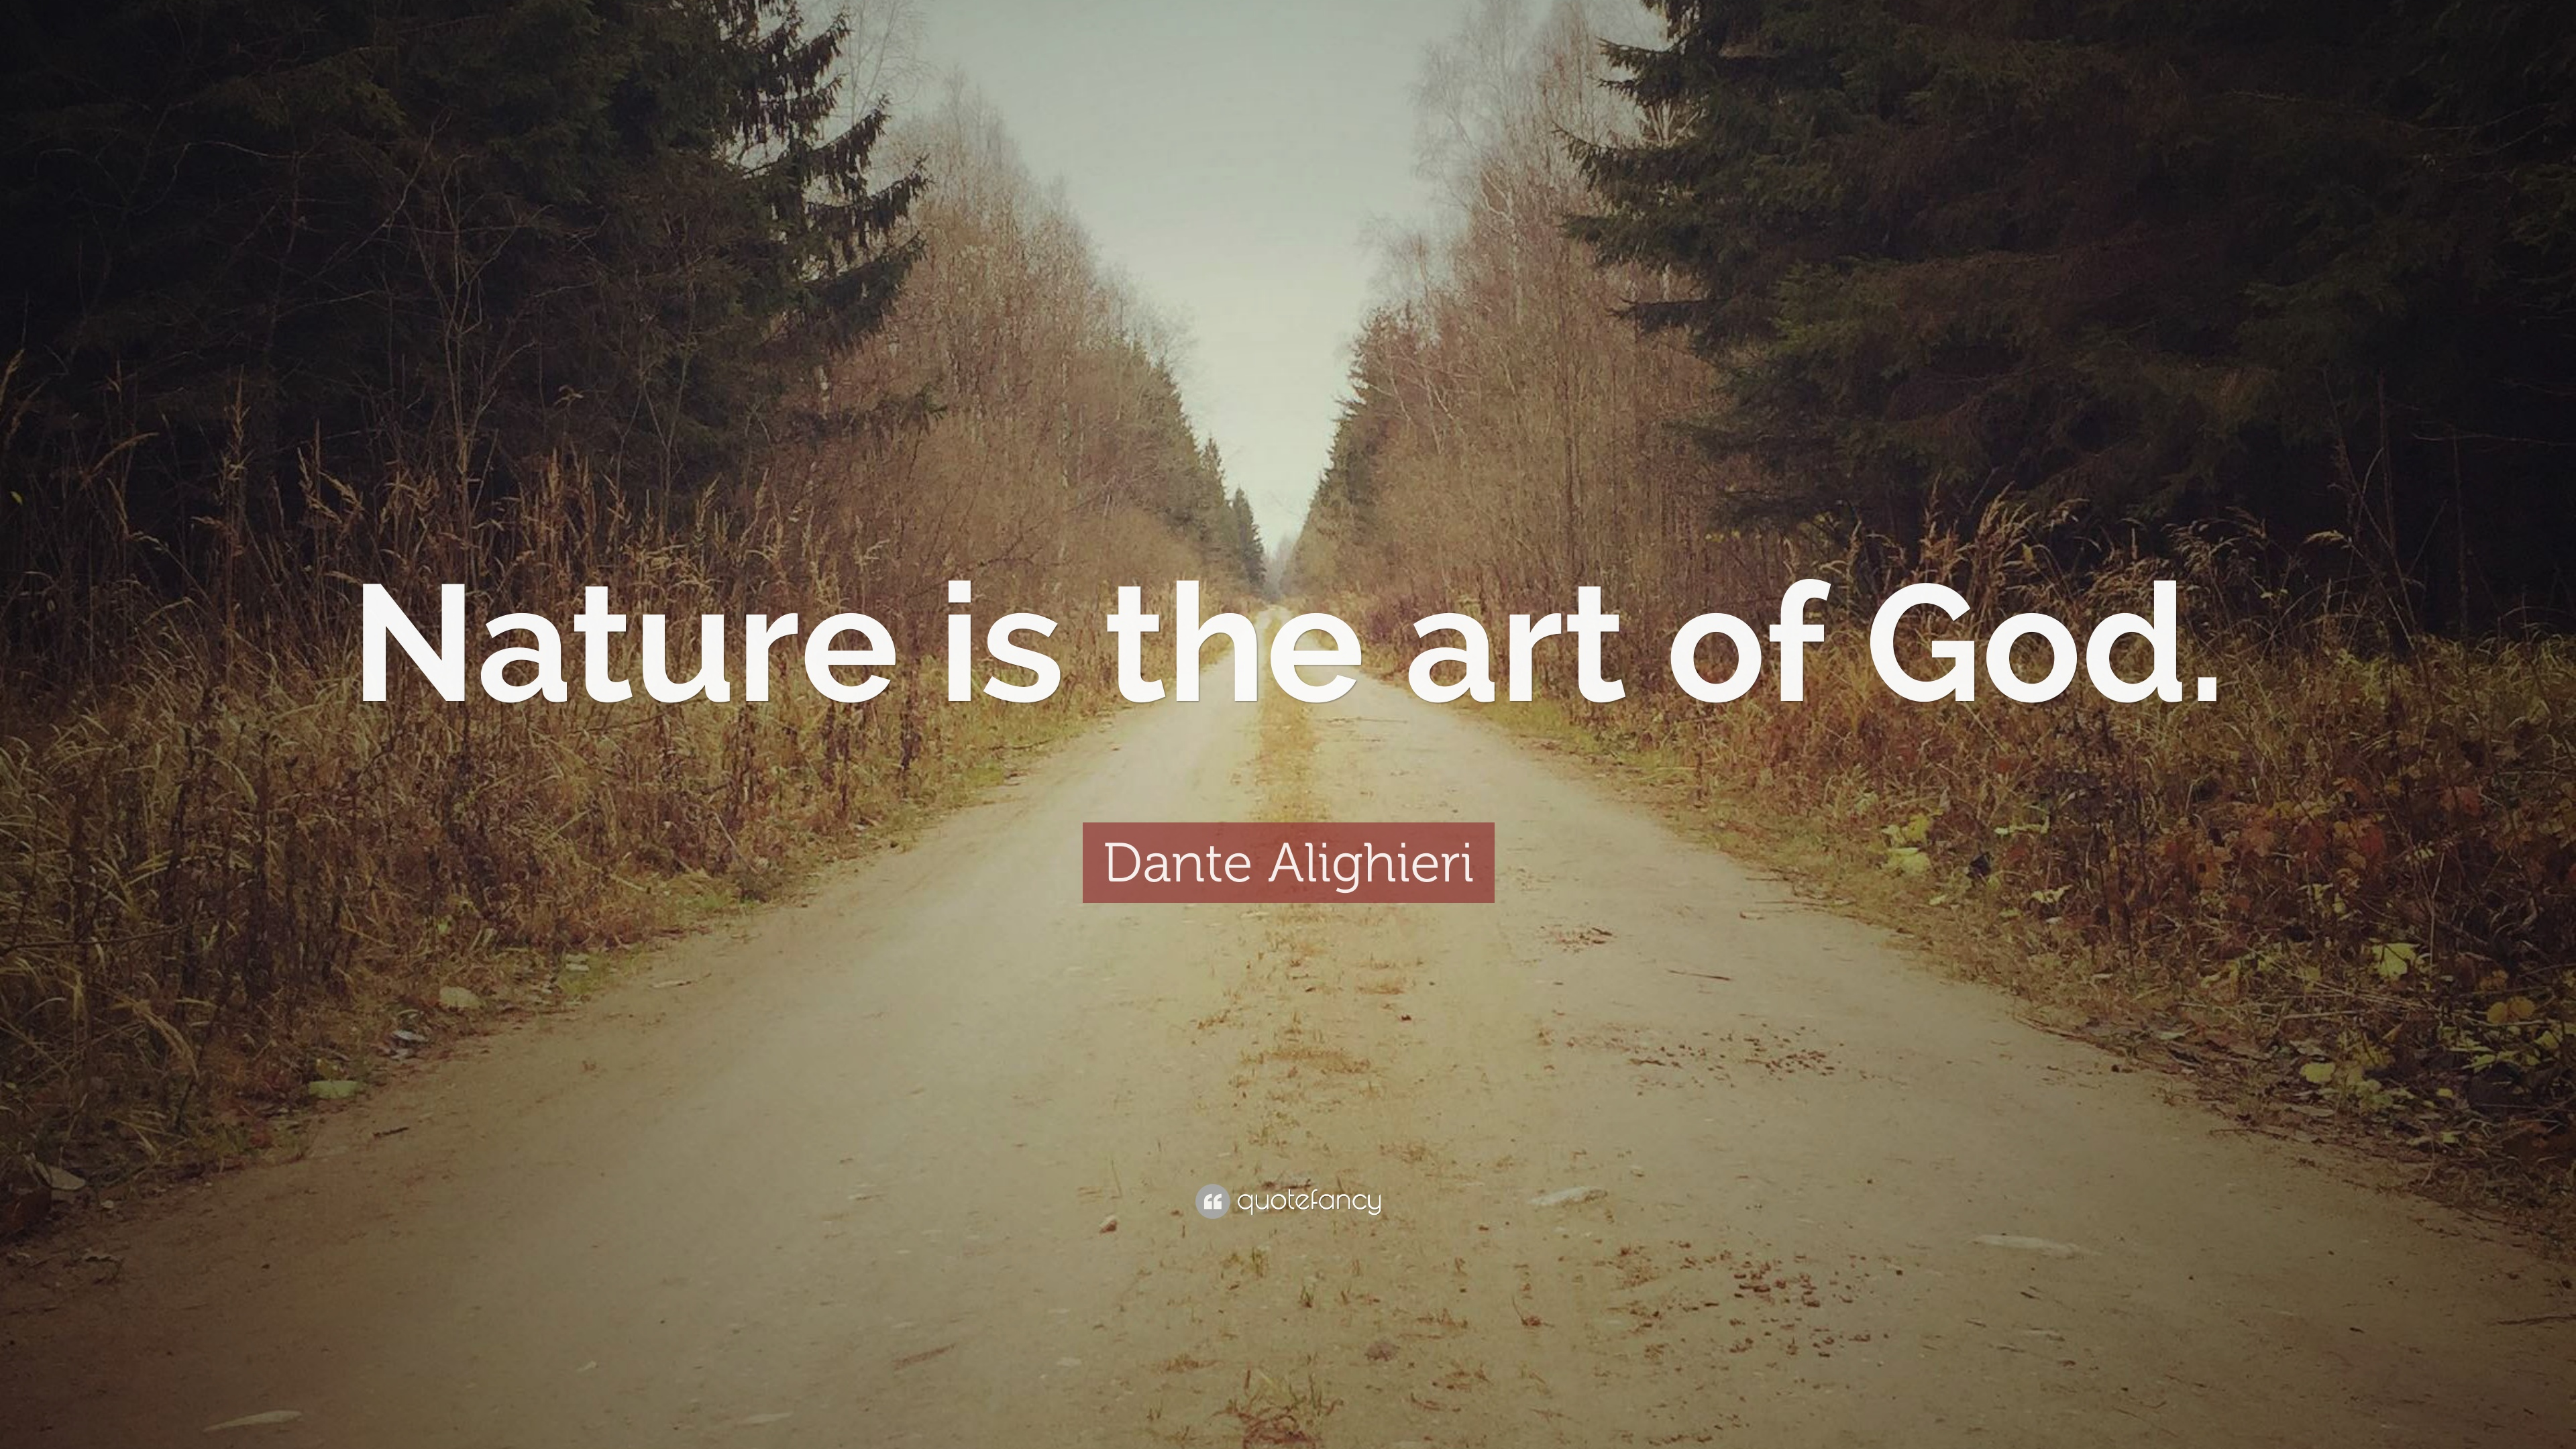 Dante Alighieri Quote Nature Is The Art Of God 25 Wallpapers